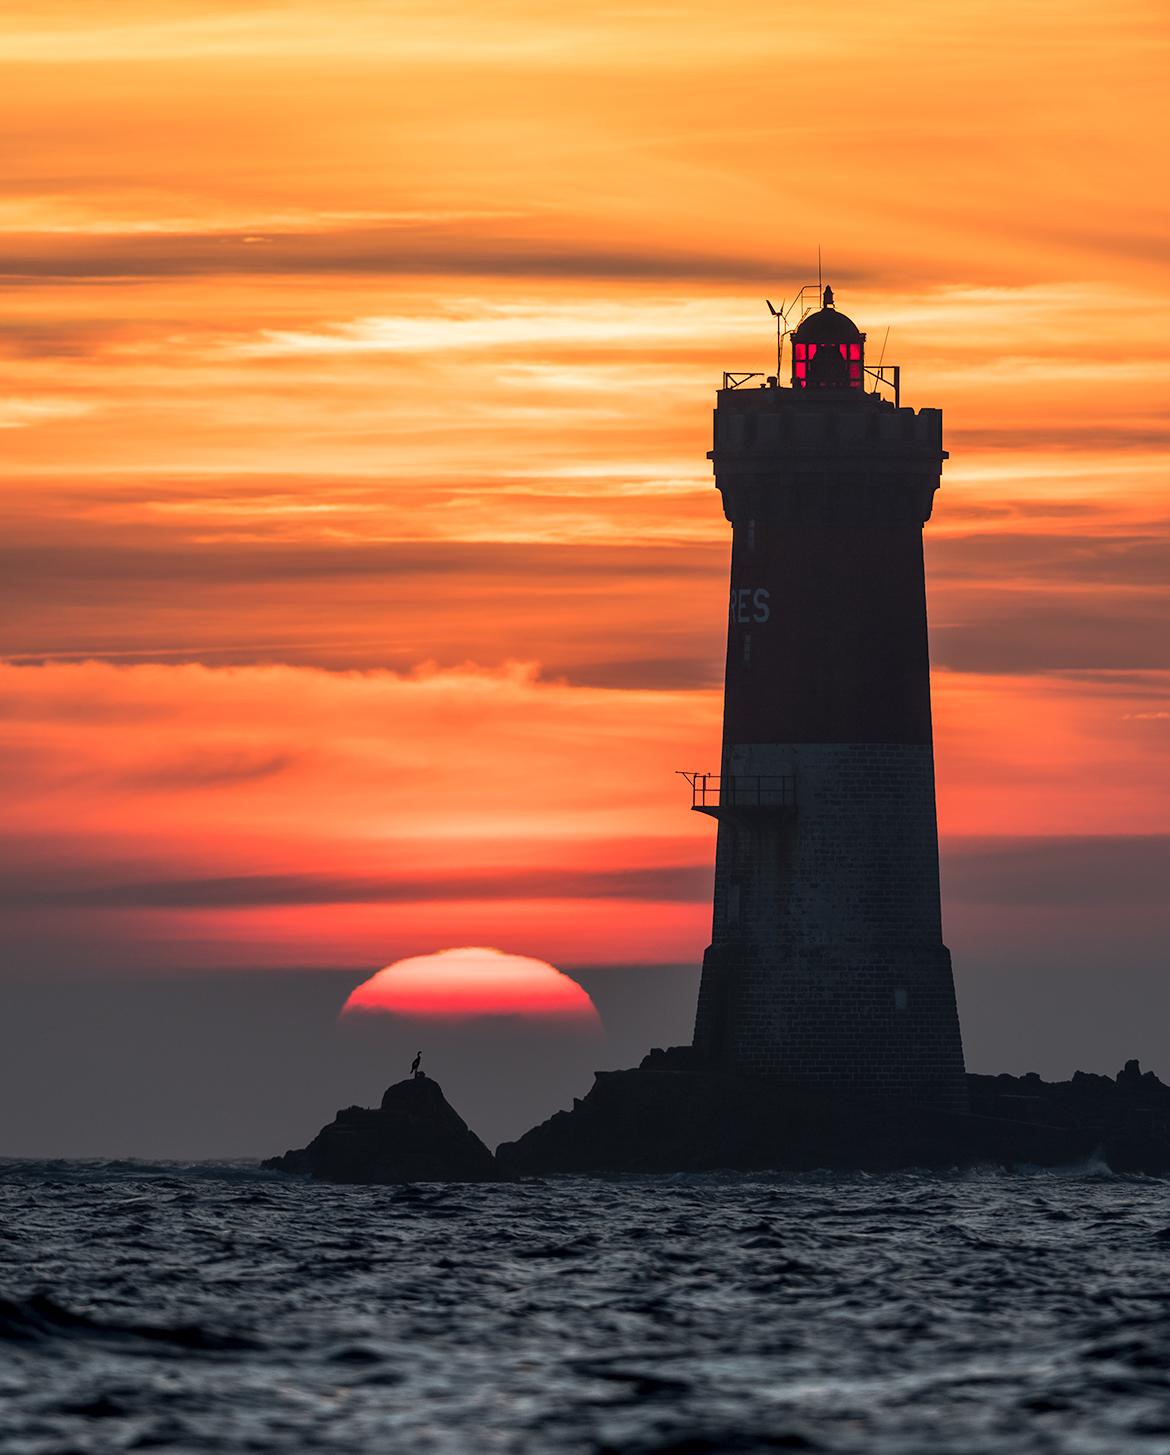 sunset-pierres-noires